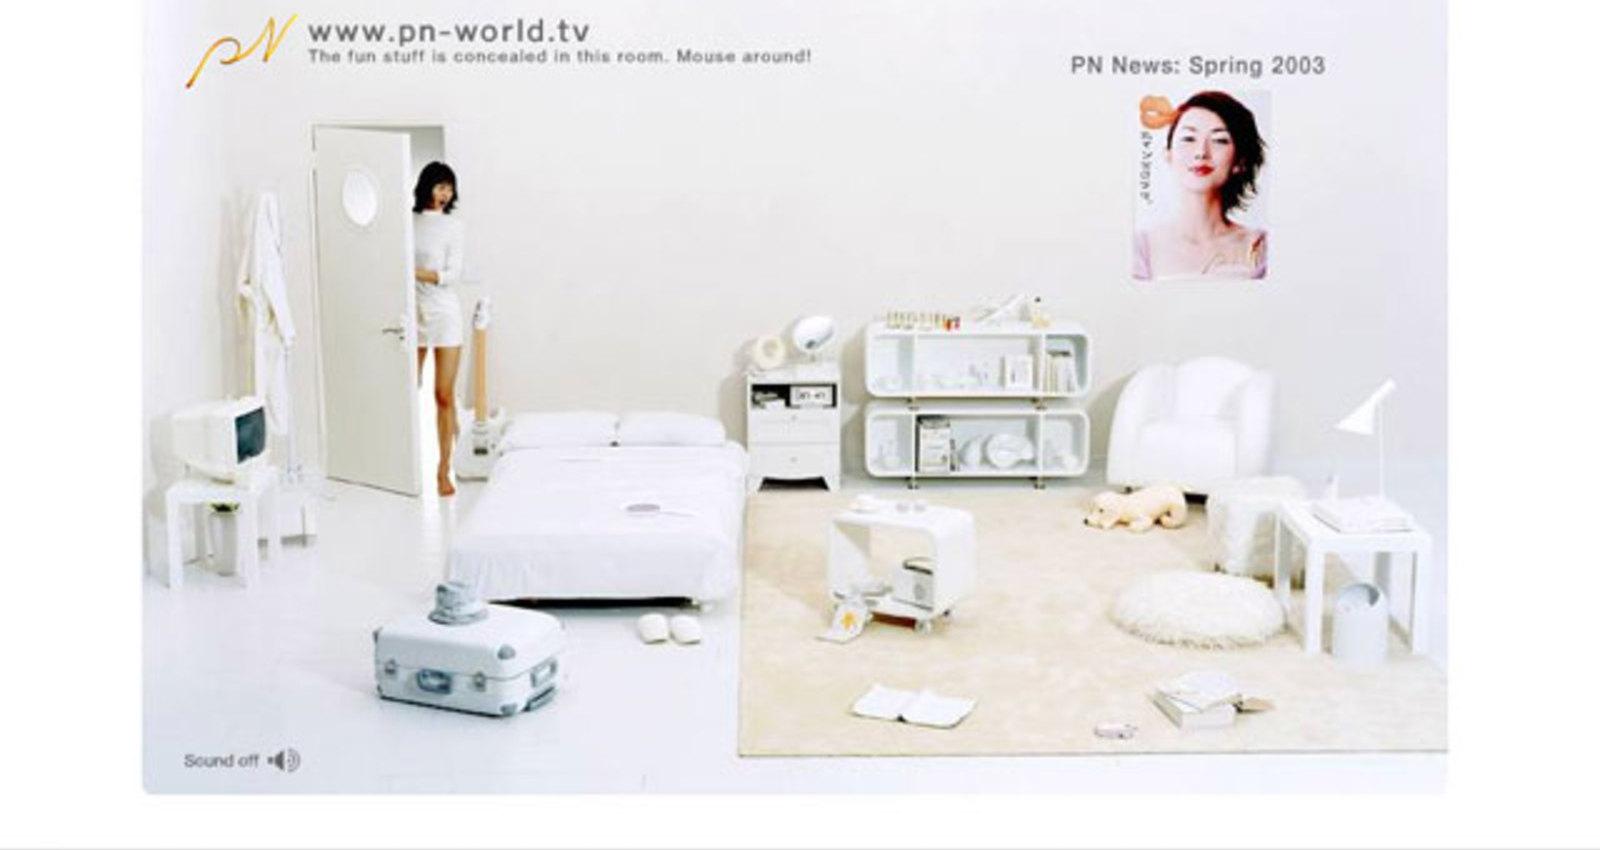 pn-world.tv